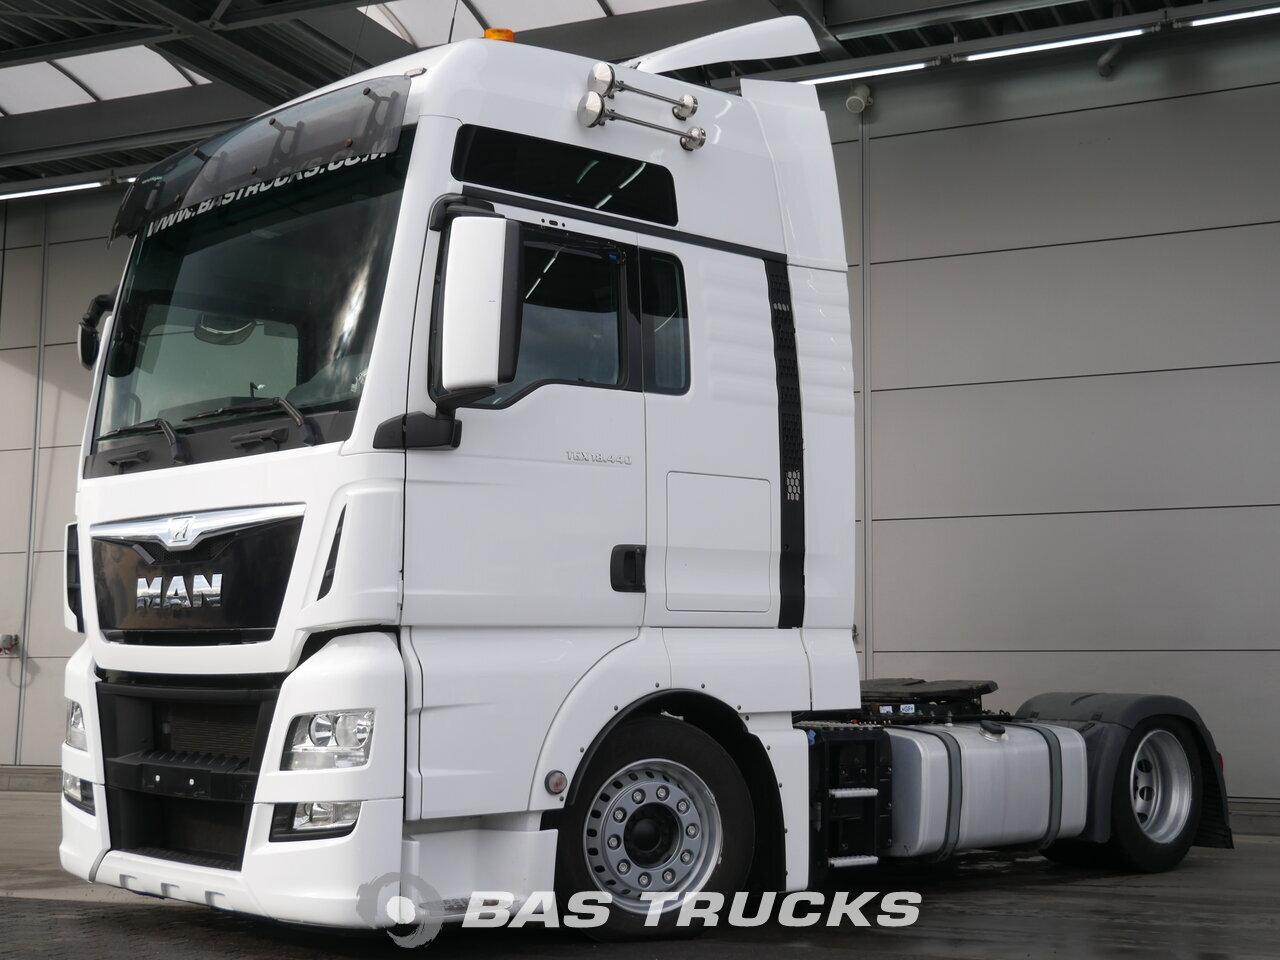 man tgx xxl tractorhead euro norm 6 35400 bas trucks. Black Bedroom Furniture Sets. Home Design Ideas